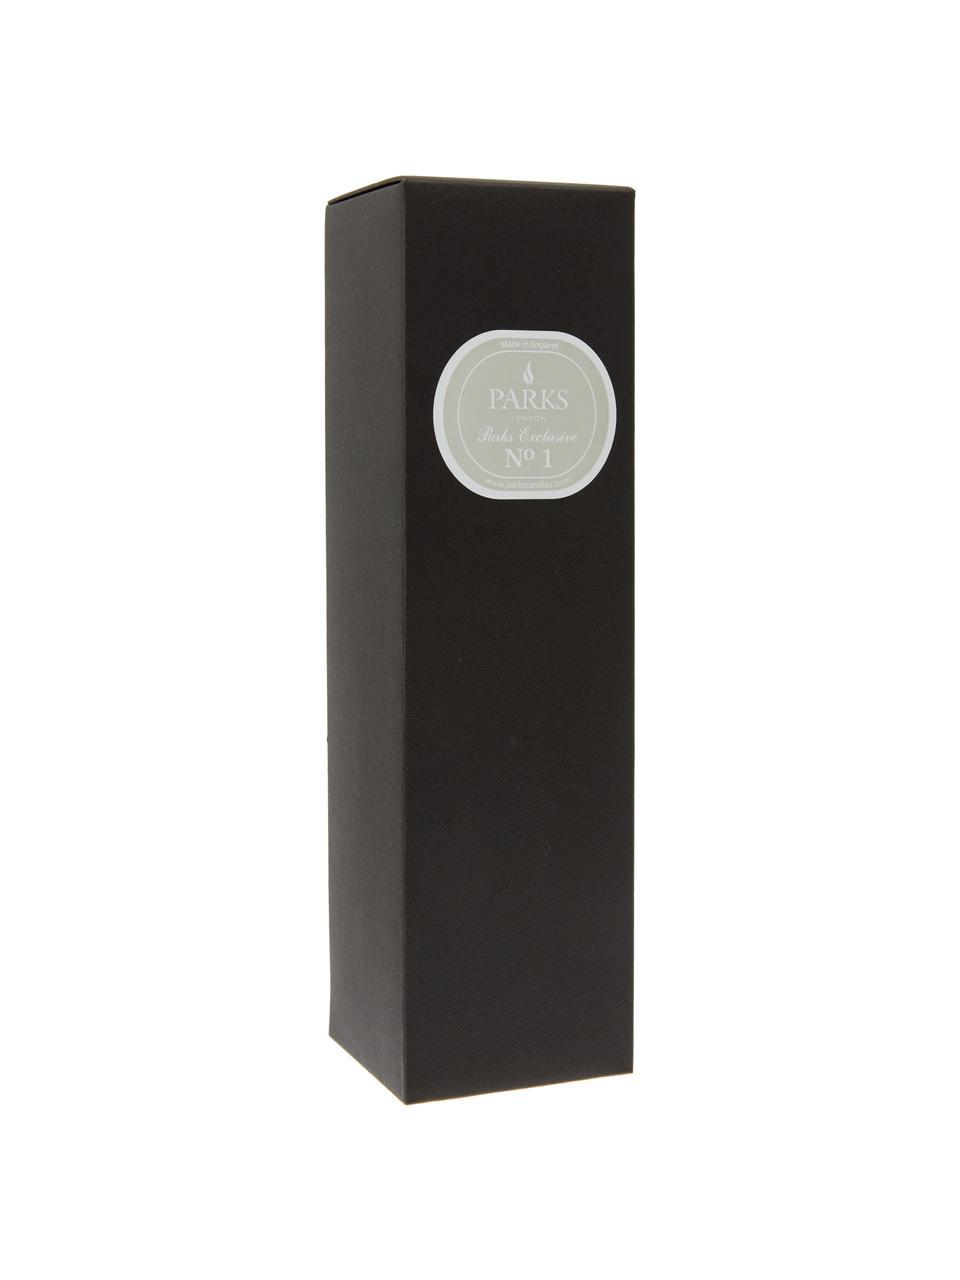 Diffuser Parks Exclusive No.1 (Sandelholz & Vanille), Transparent, Hellbraun, Grau, 250 ml